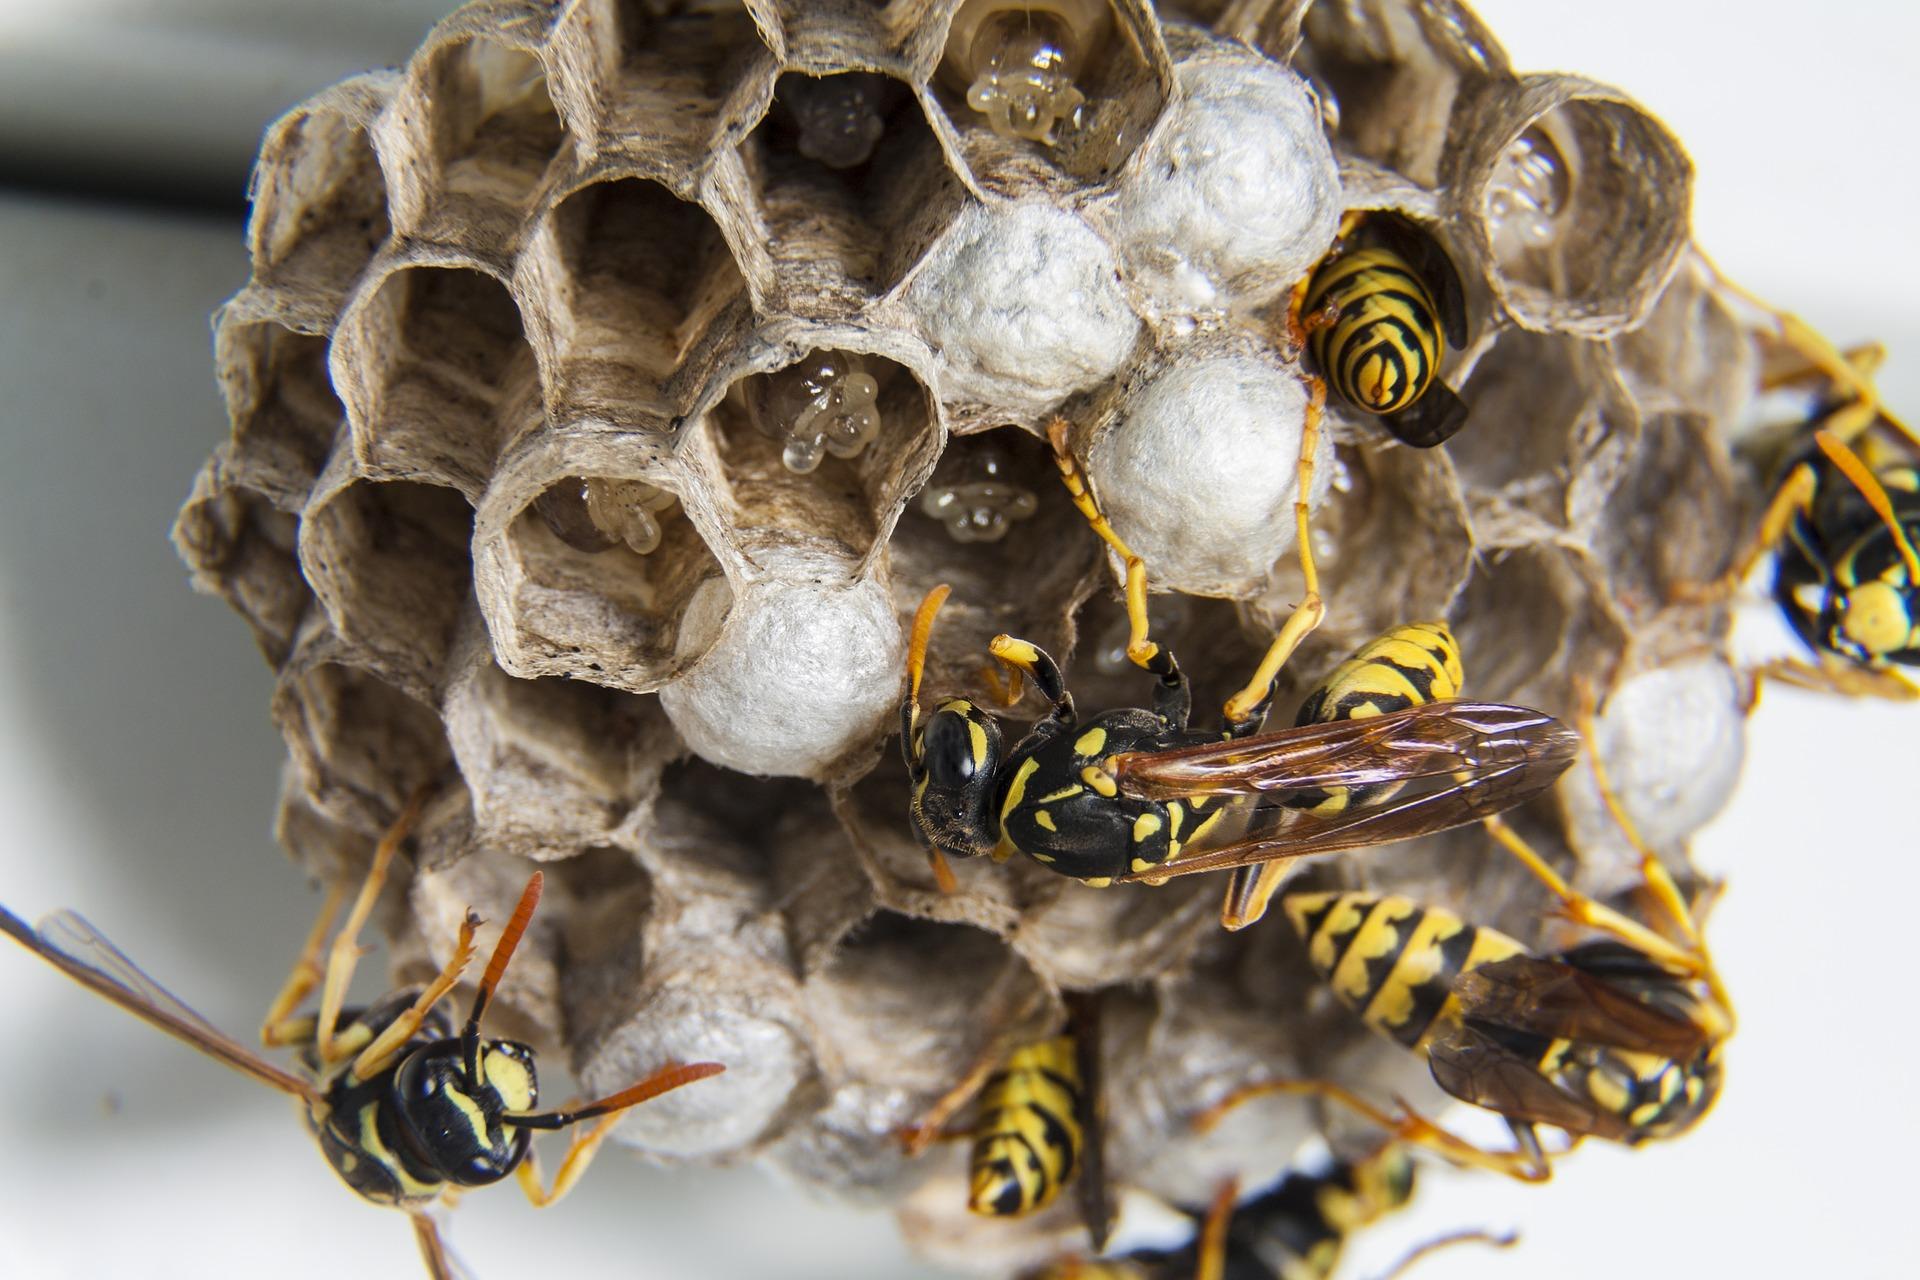 1 swarm-1903243_1920